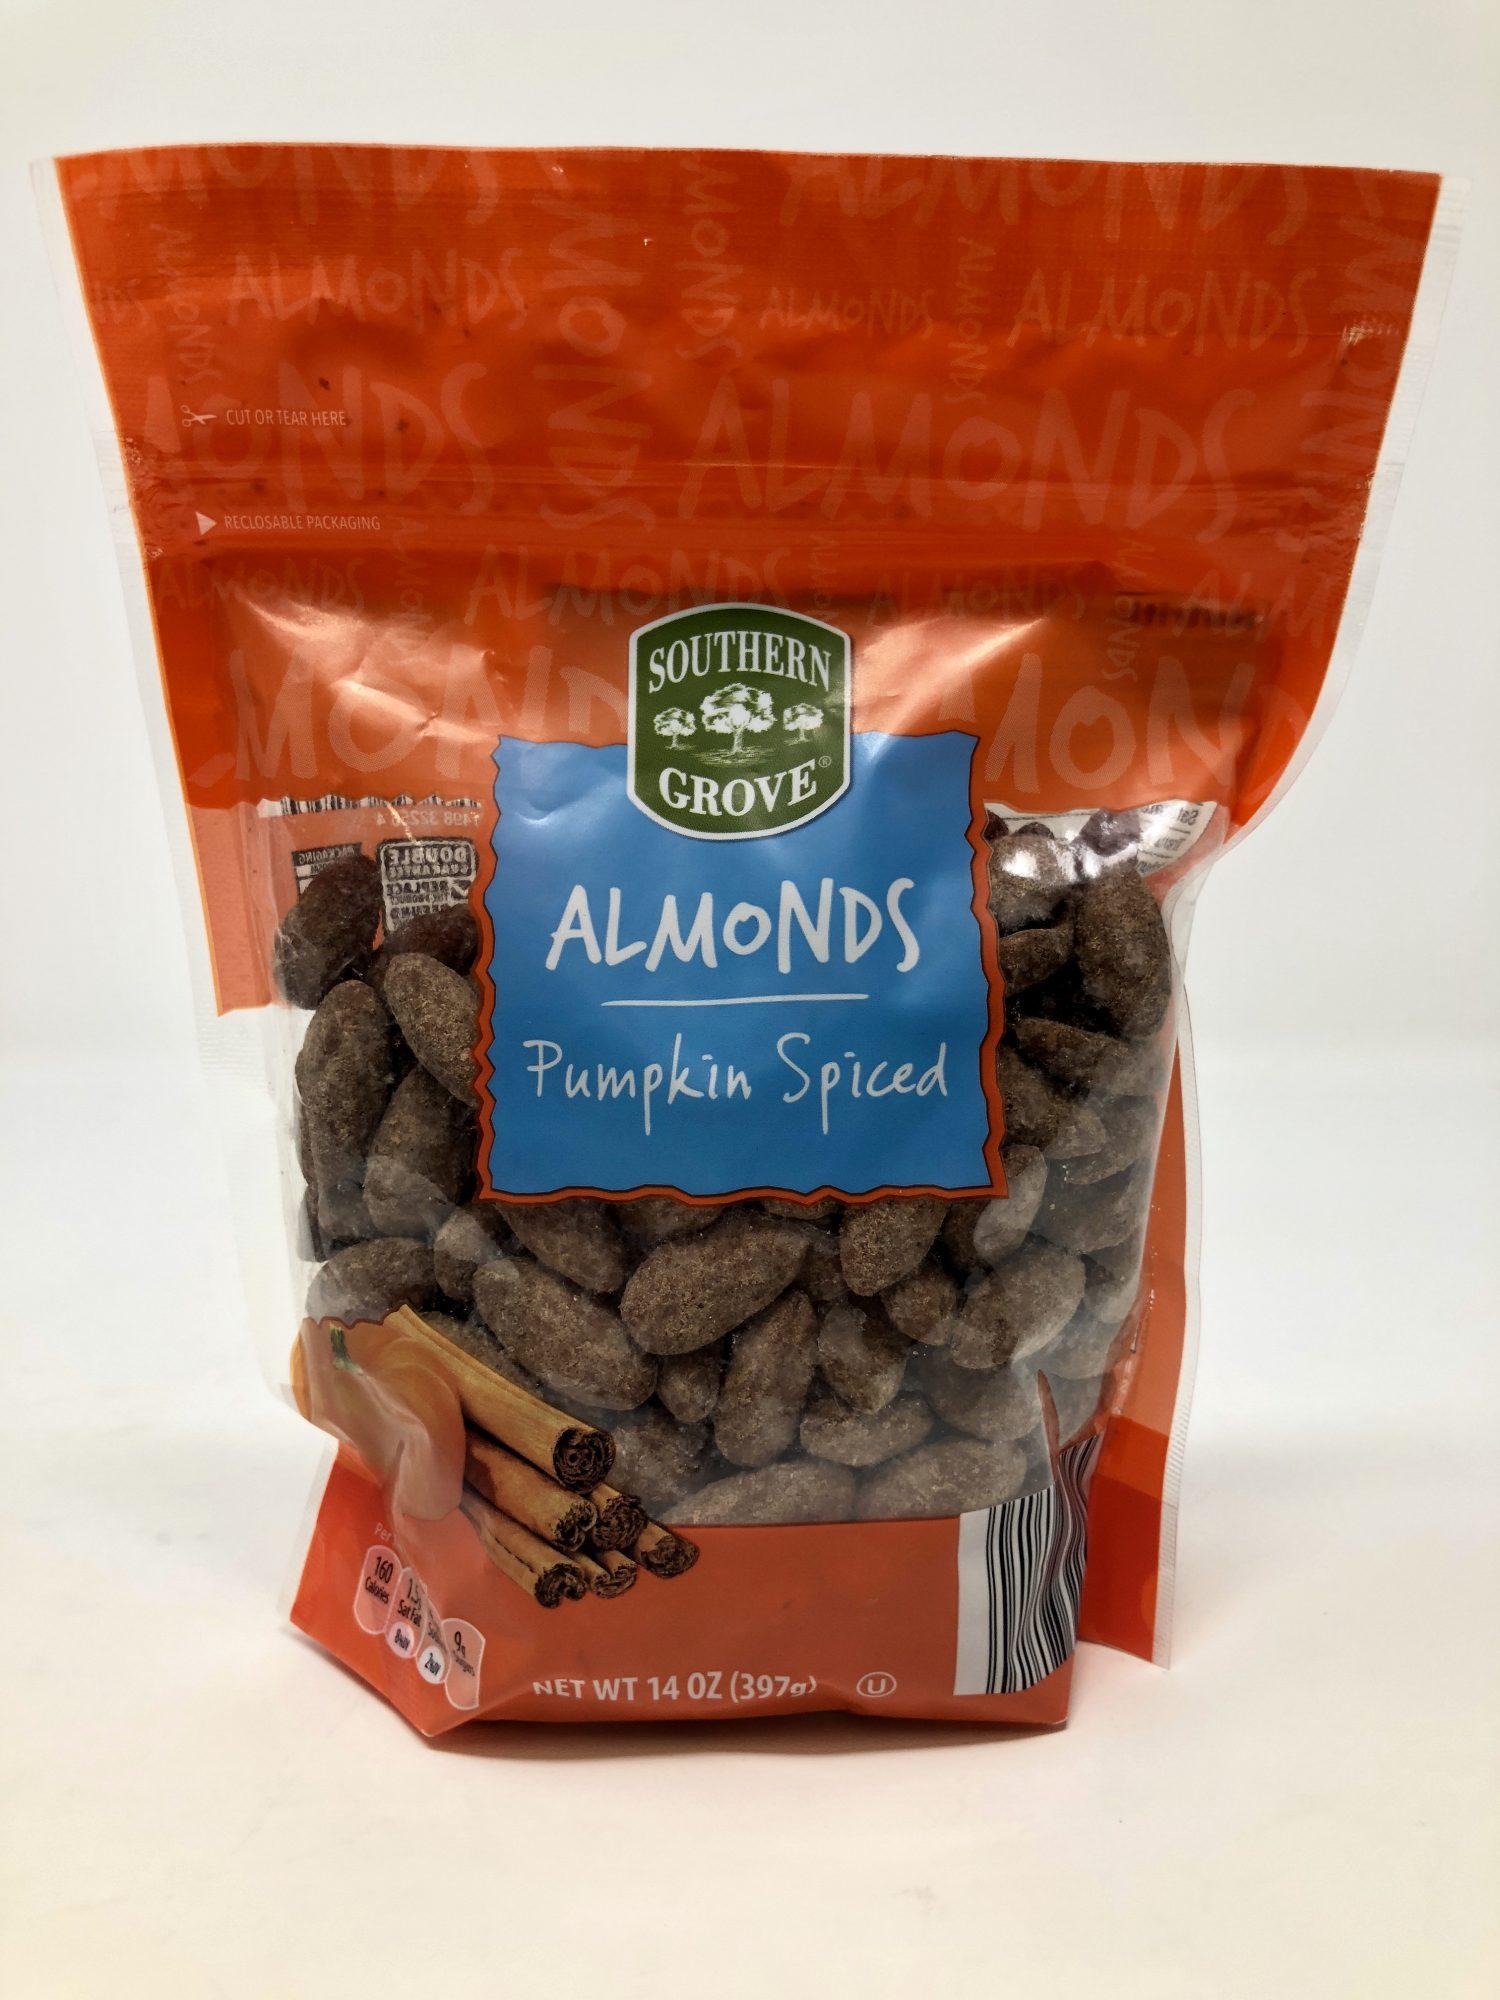 Southern Grove Pumpkin Spiced Almonds[1]